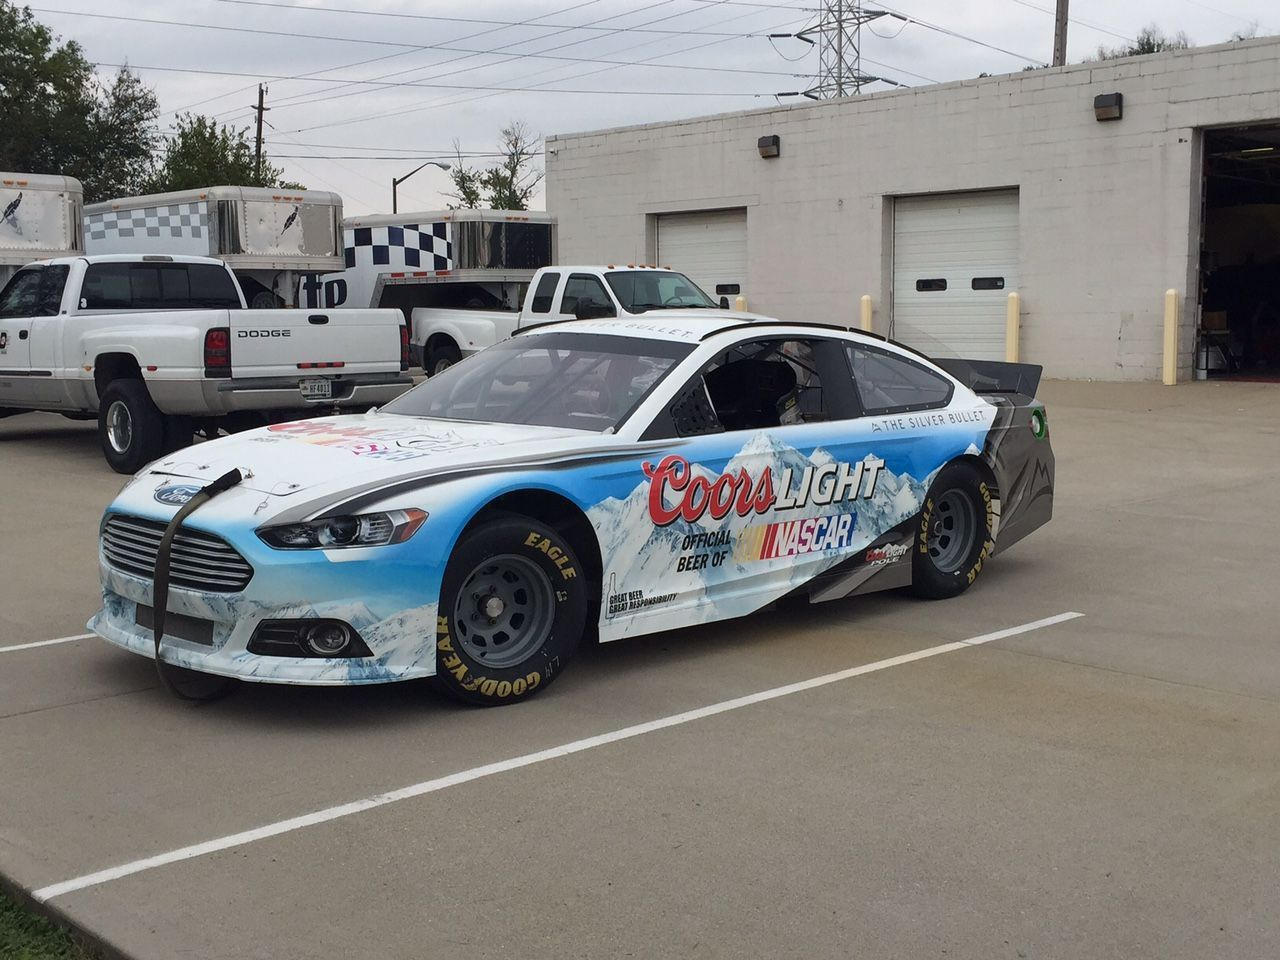 Nascar show car ford fusion